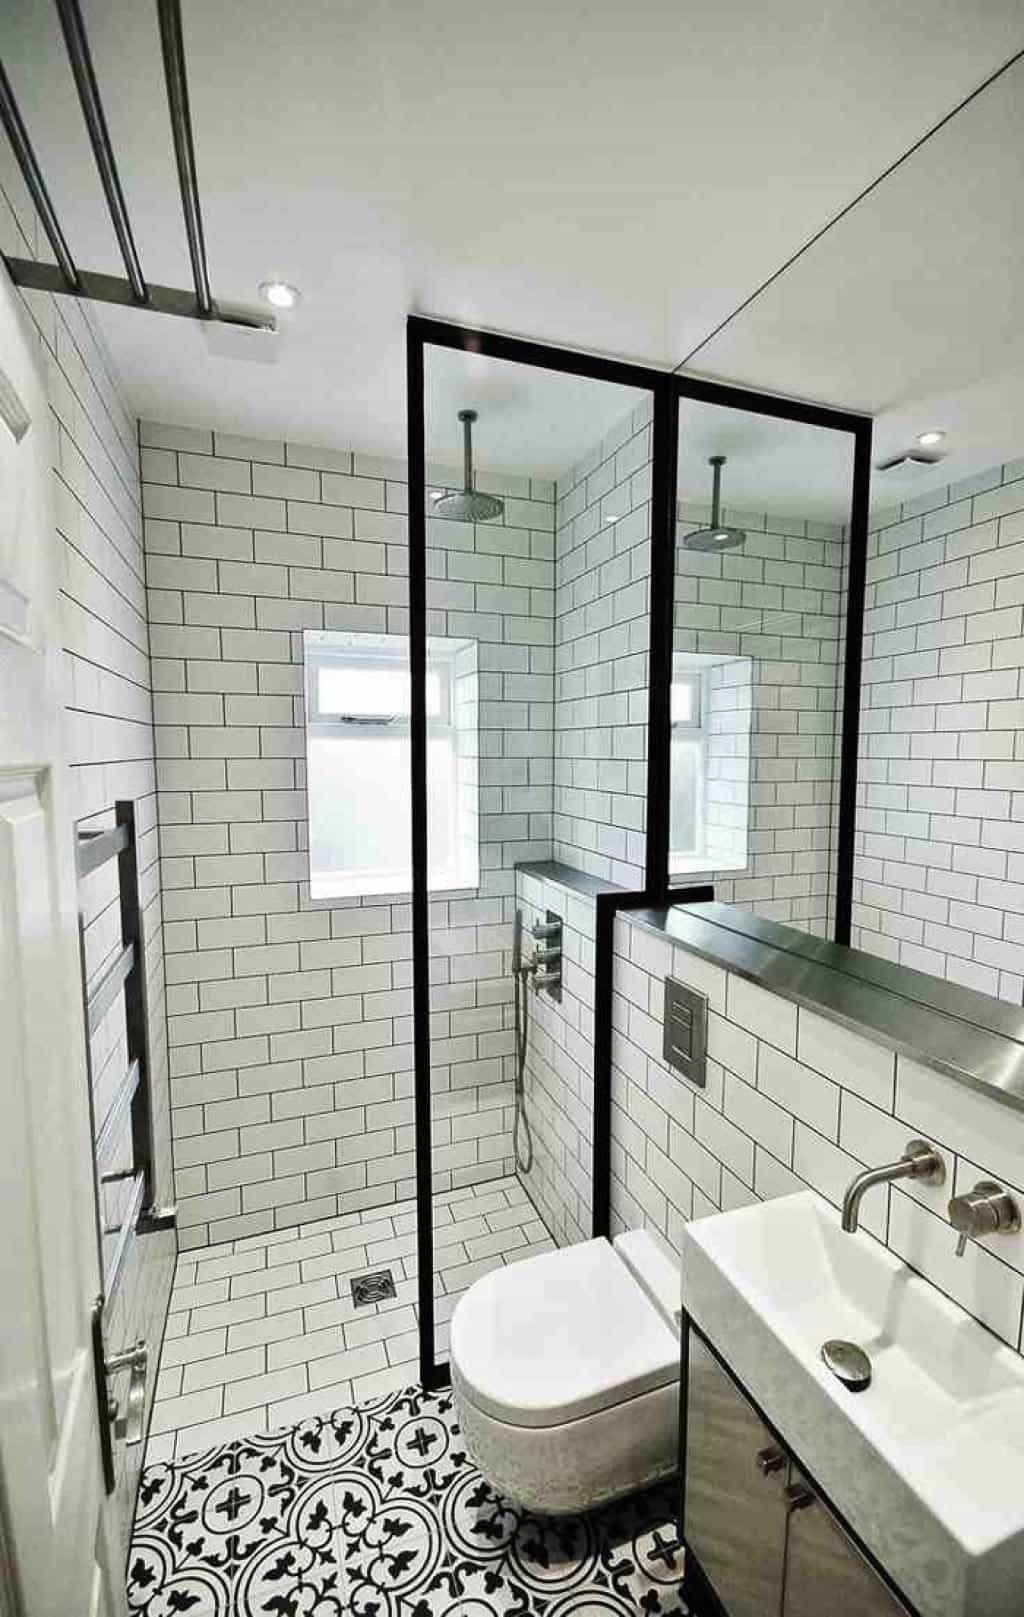 Ways To Clean Your Bathroom Shower Tiles | Tile showers, Tile ideas ...